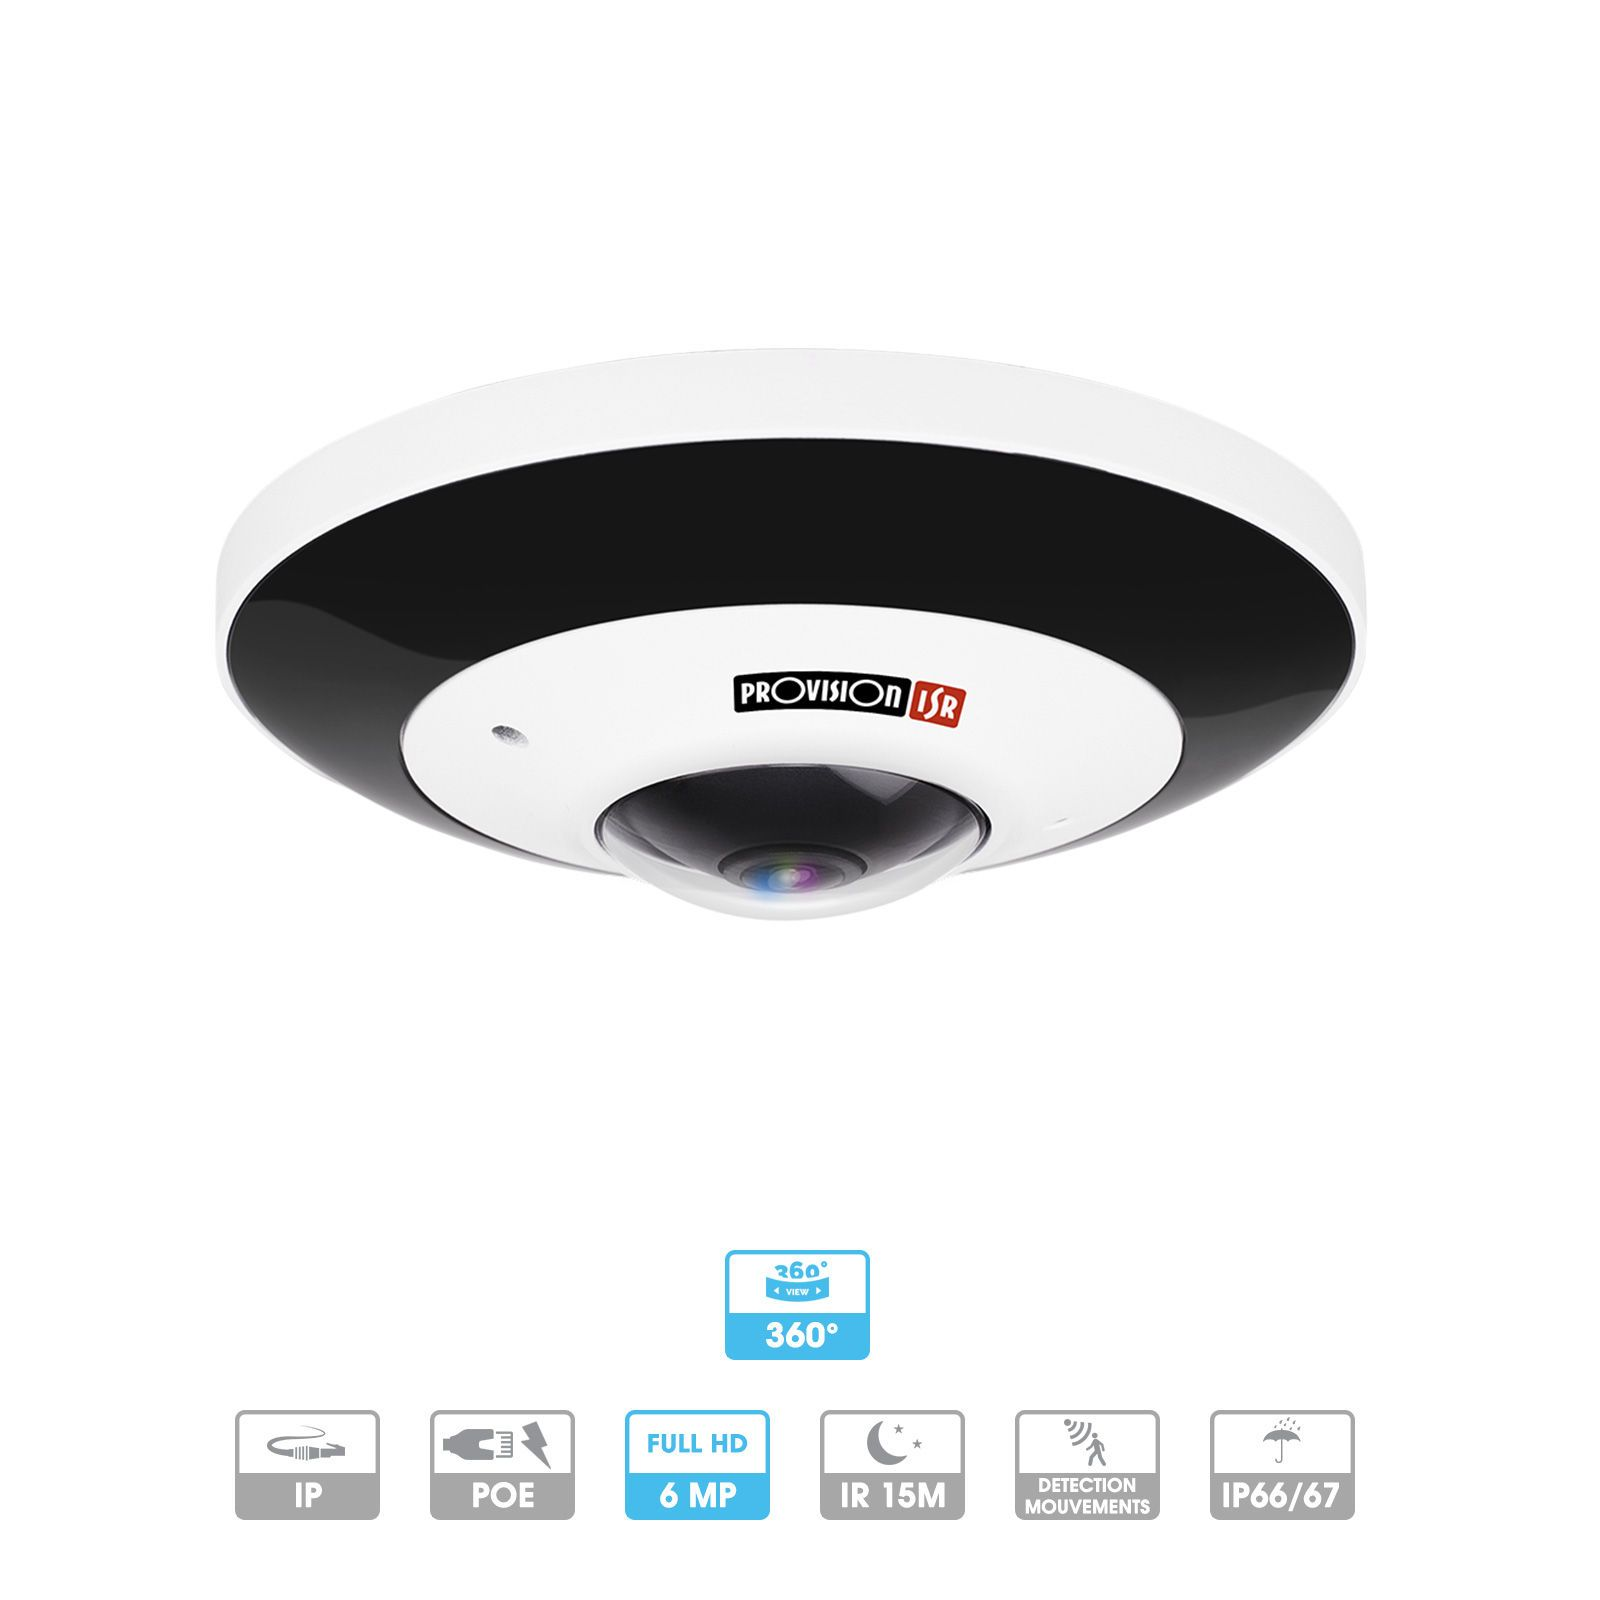 Caméra Provision | Fisheye | 180°/360° | 6 MP | IP | Antivandalisme | Microphone intégré